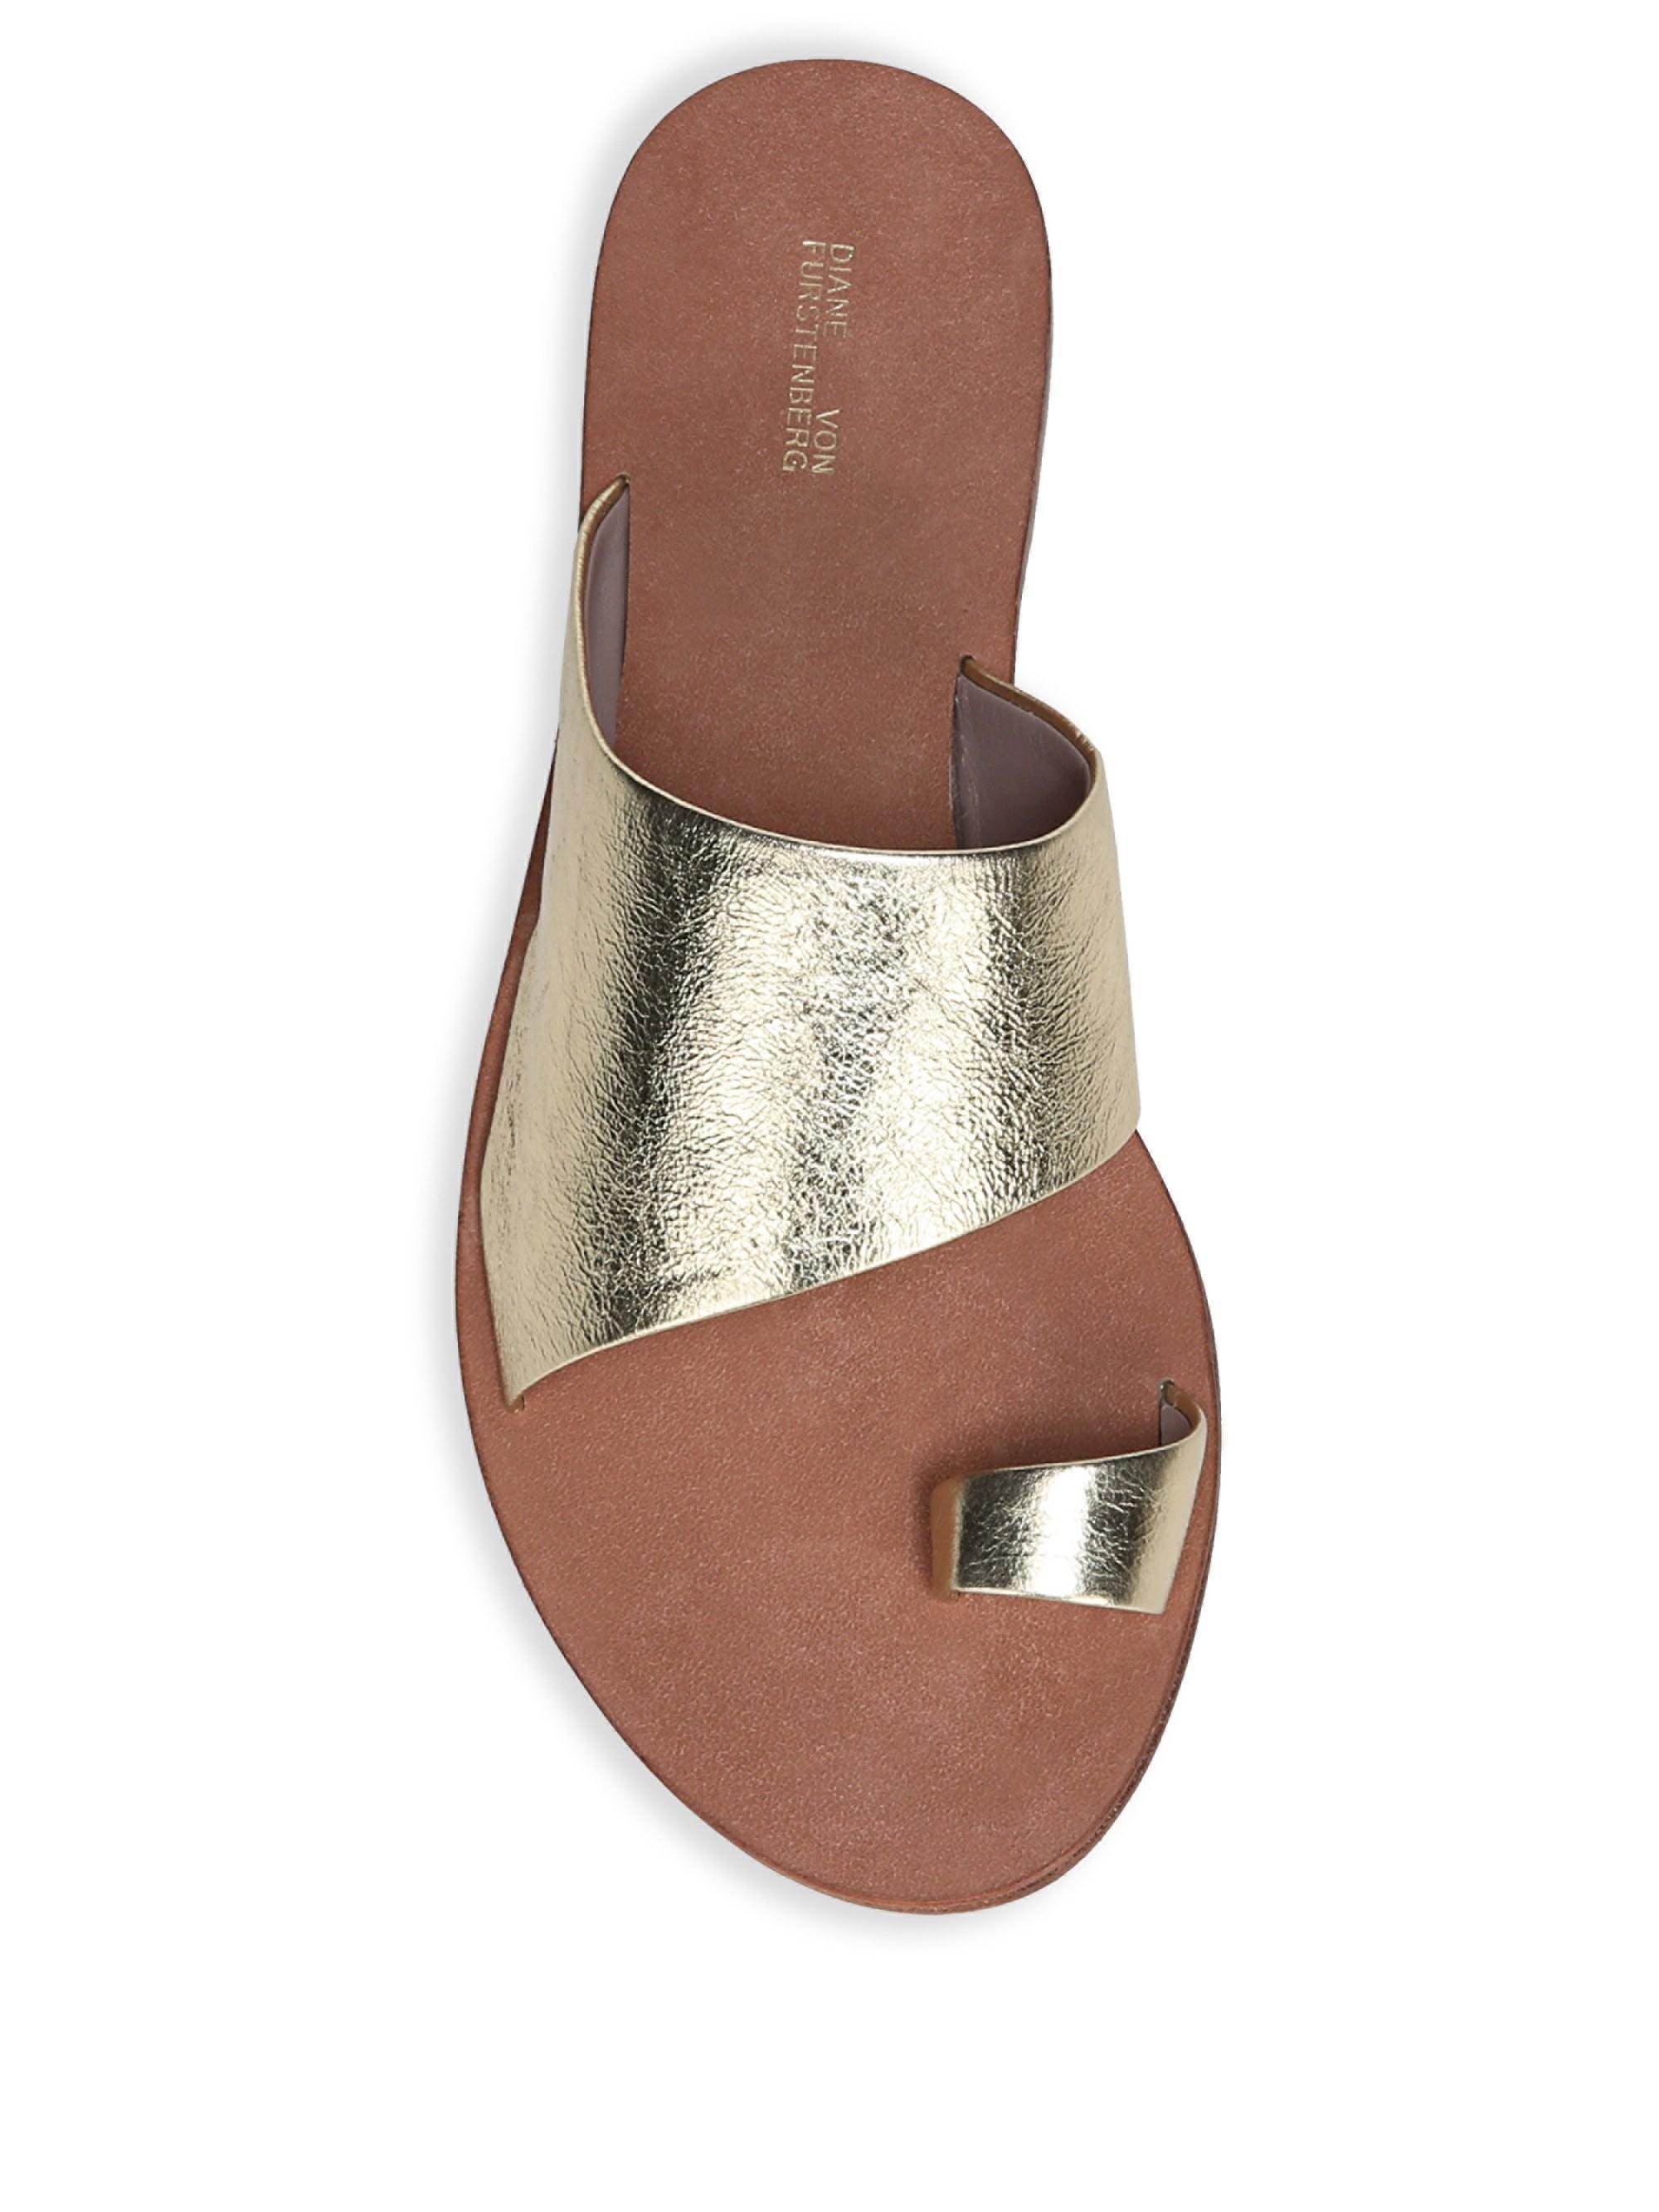 083c33b4a5f031 Lyst - Diane von Furstenberg Women s Brittany Gold Toe Ring Sandal - Gold -  Size 35 (5) in Metallic